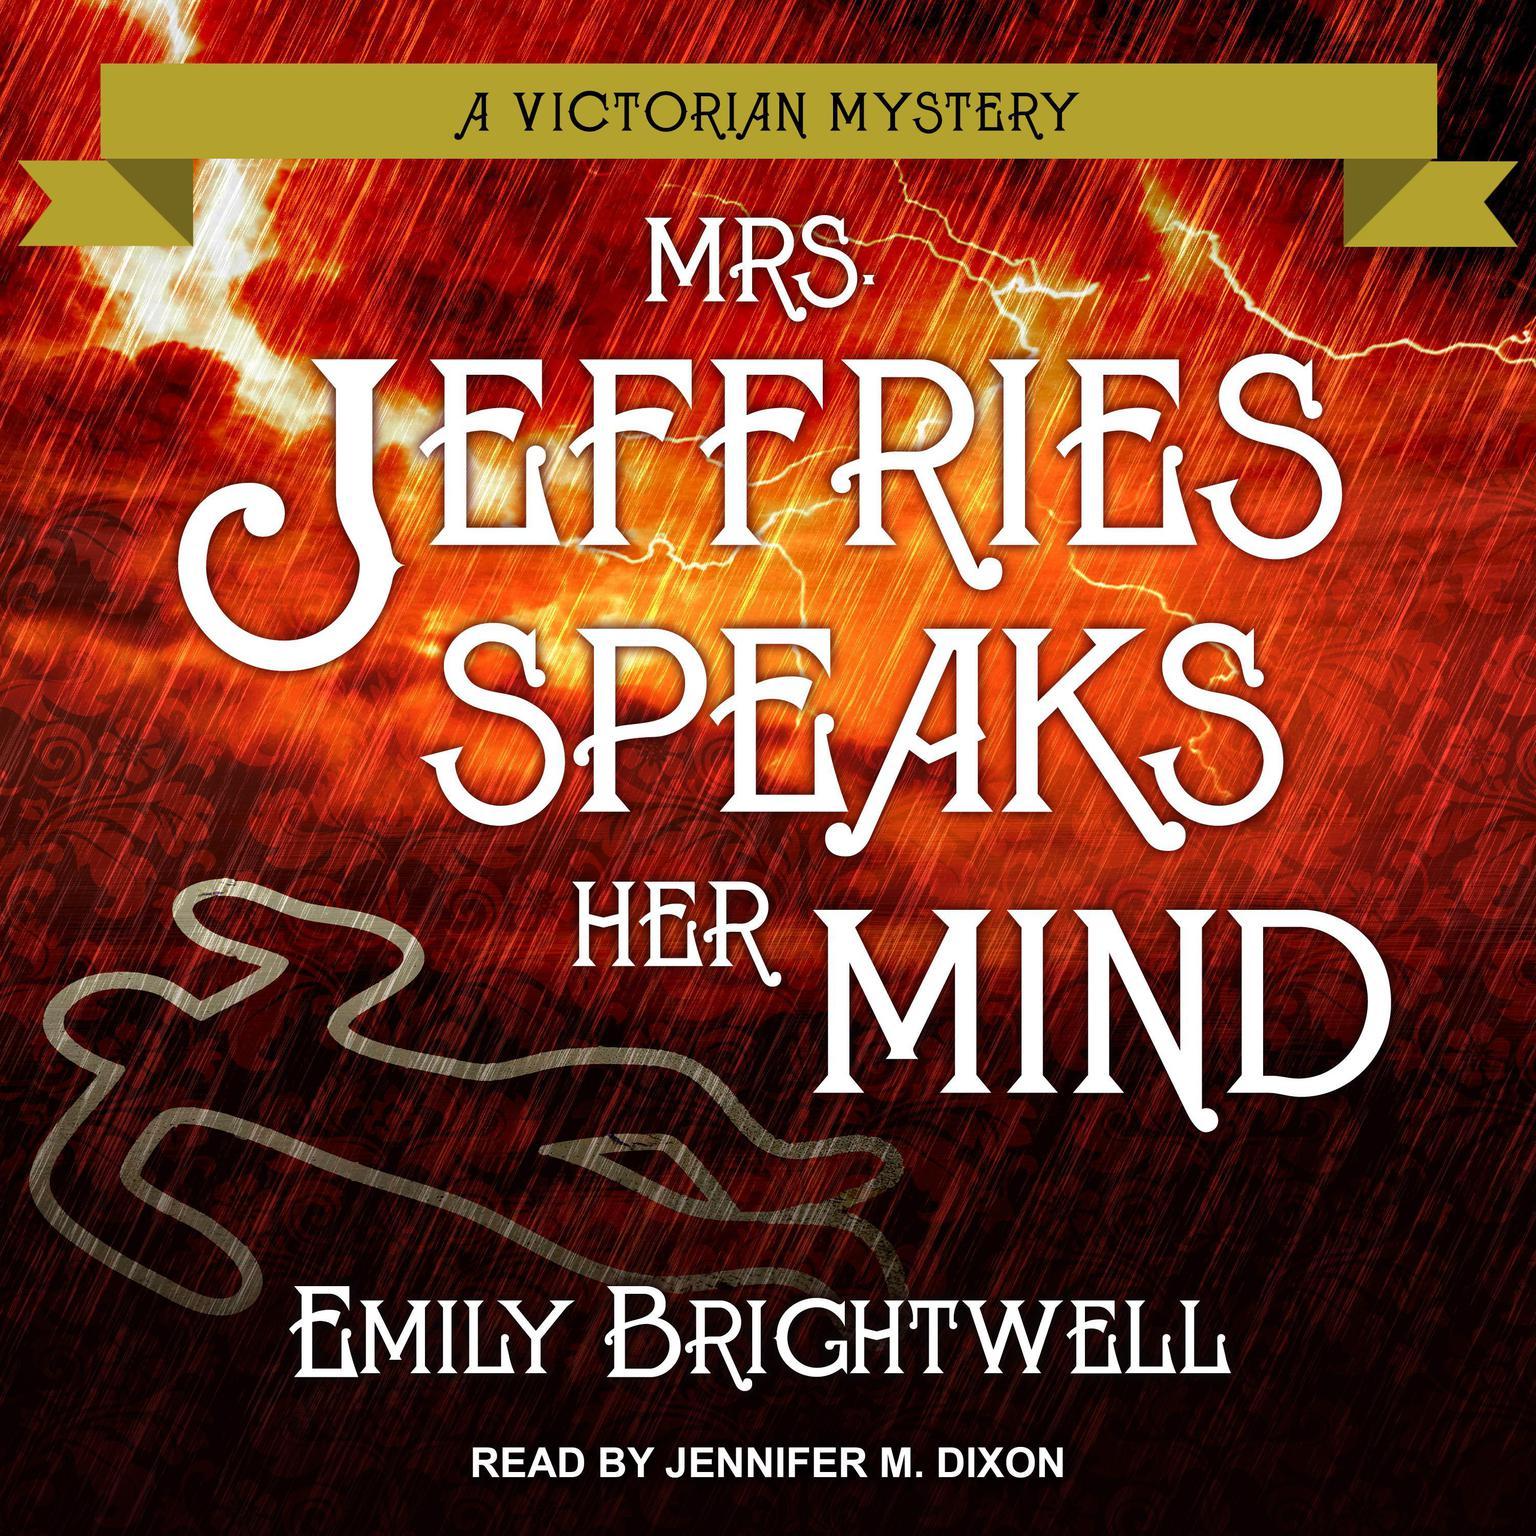 Mrs. Jeffries Speaks Her Mind Audiobook, by Emily Brightwell